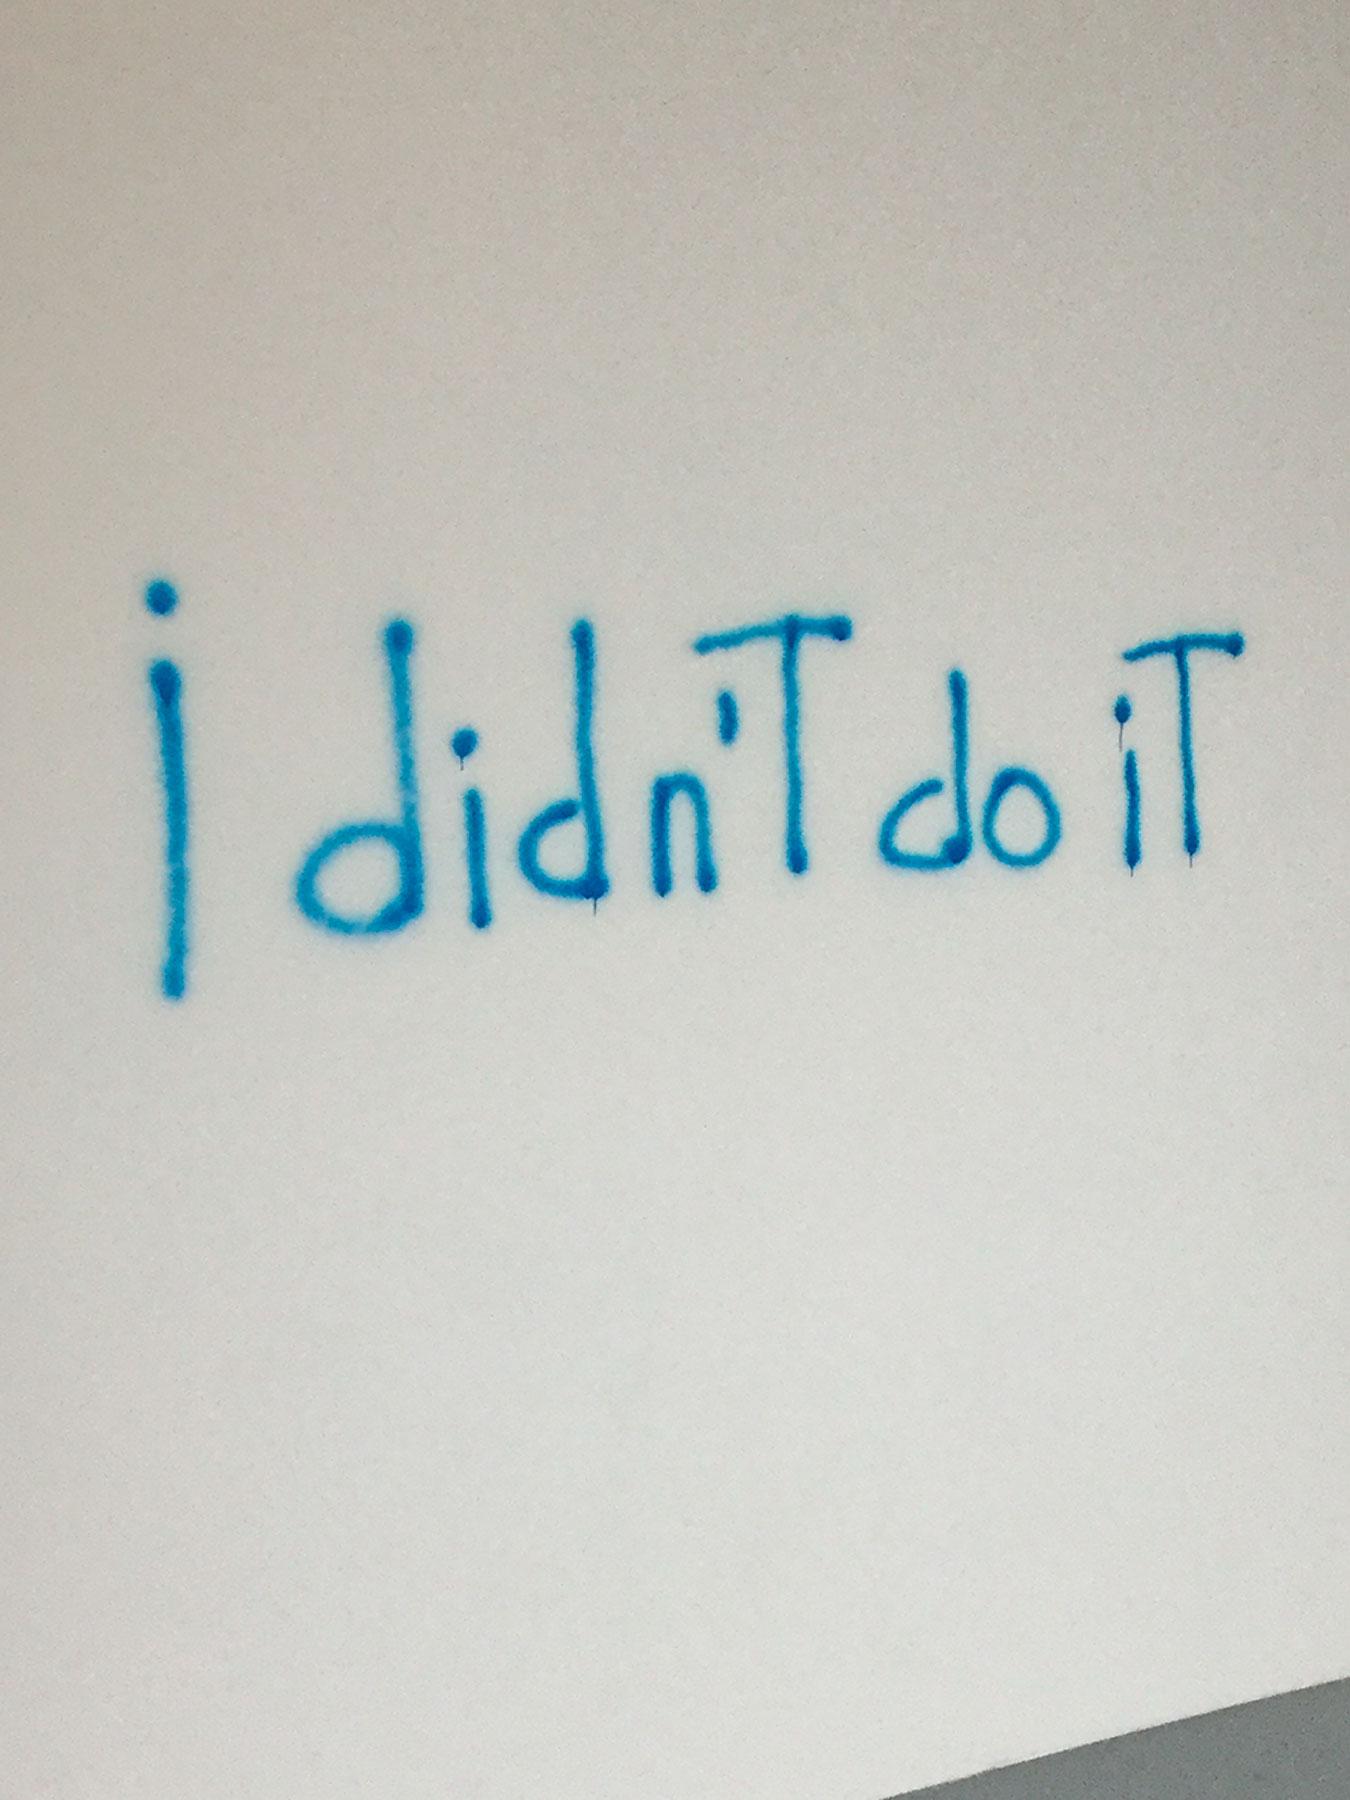 I-didn-t-do-it-by-Ria-Pacquée_foto-Marc-Vanrunxt